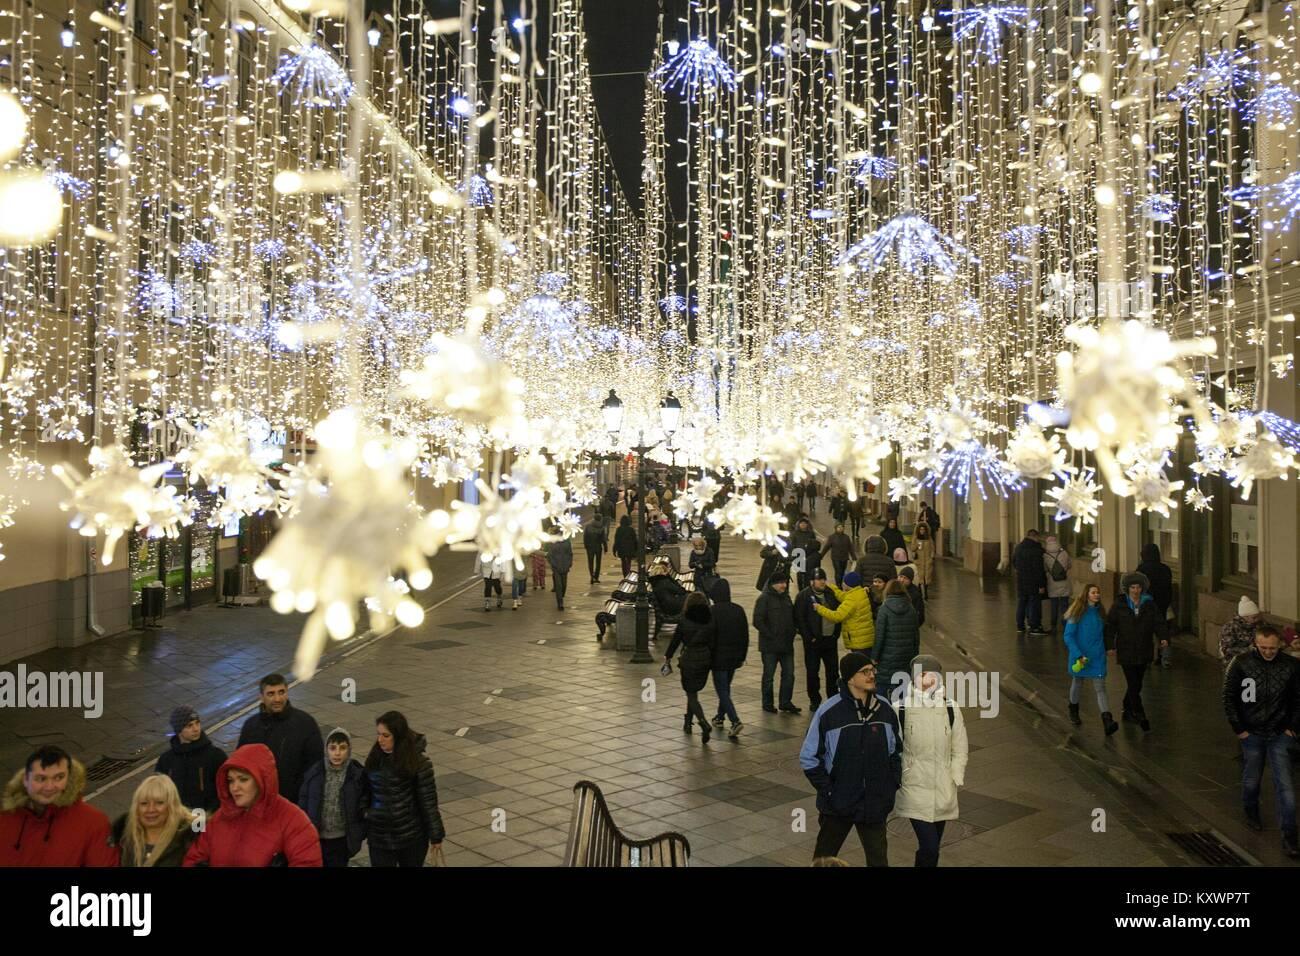 moskau russland januar 7 2018 moskau nikolskaya street silvester weihnachten dekoration. Black Bedroom Furniture Sets. Home Design Ideas